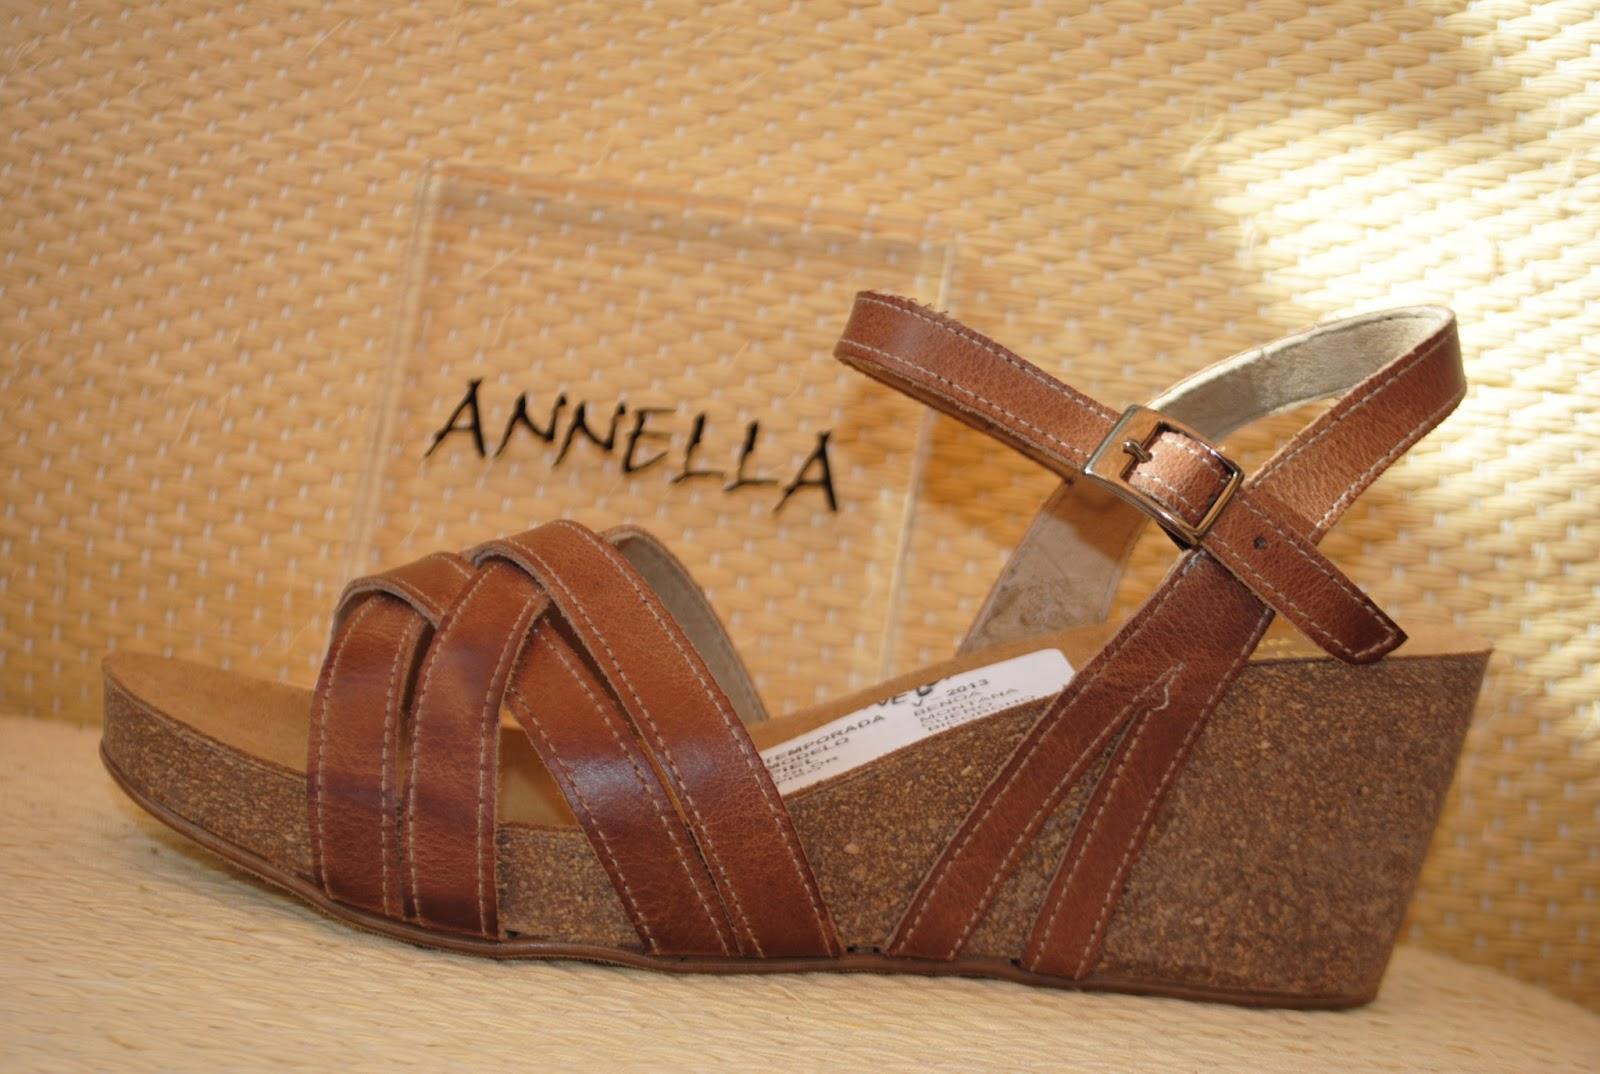 ShoesSandalias Annella PielMade Spain Con Cuña In trQCdhxBs